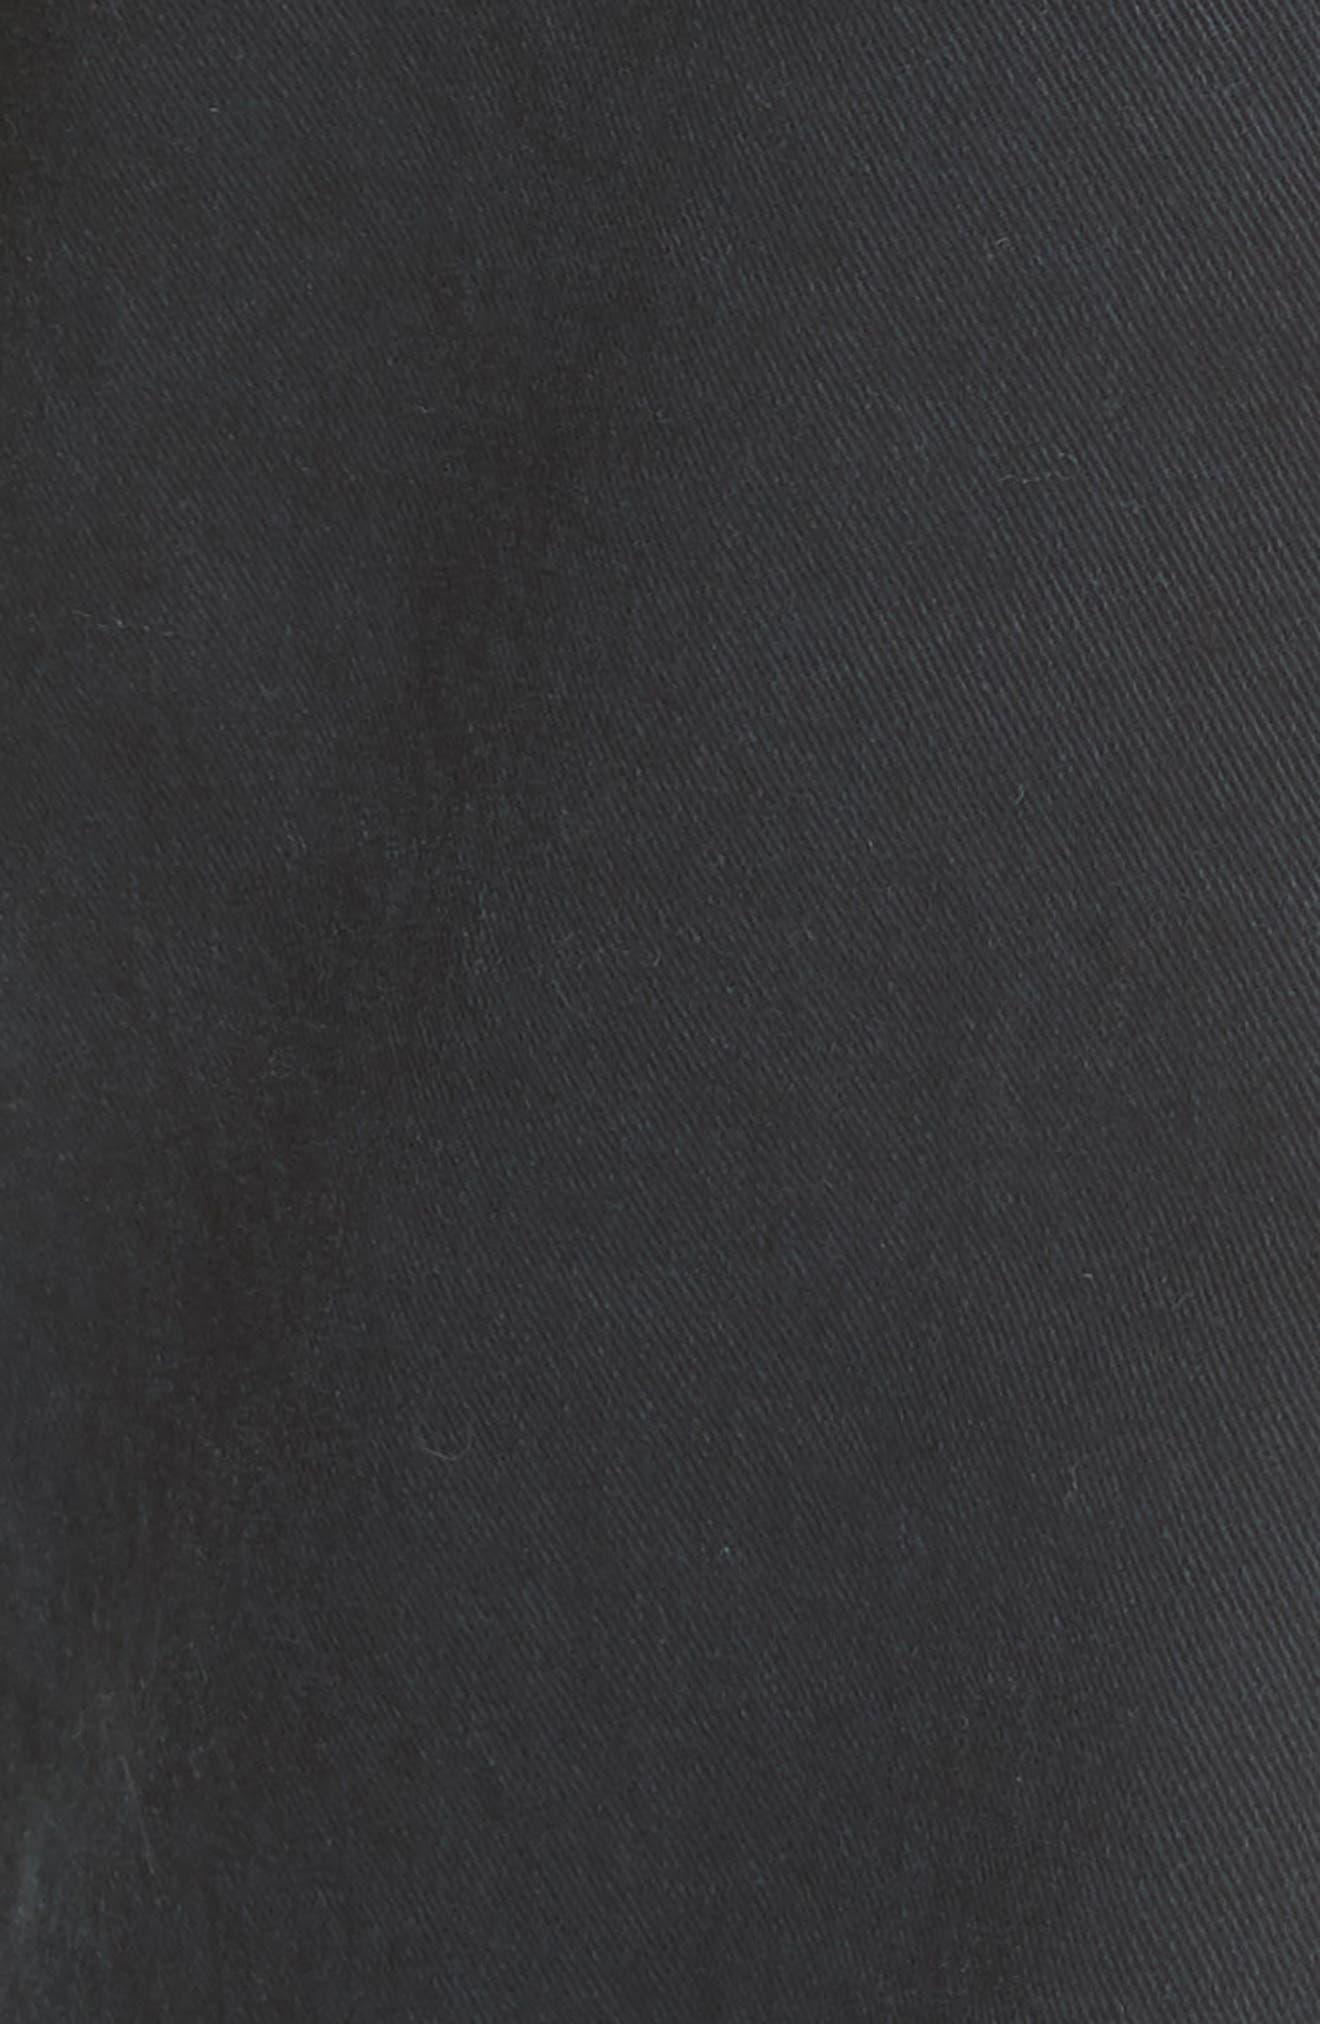 Jenna Ankle Pants,                             Alternate thumbnail 5, color,                             Dark Navy/ Green/ Gold Tape